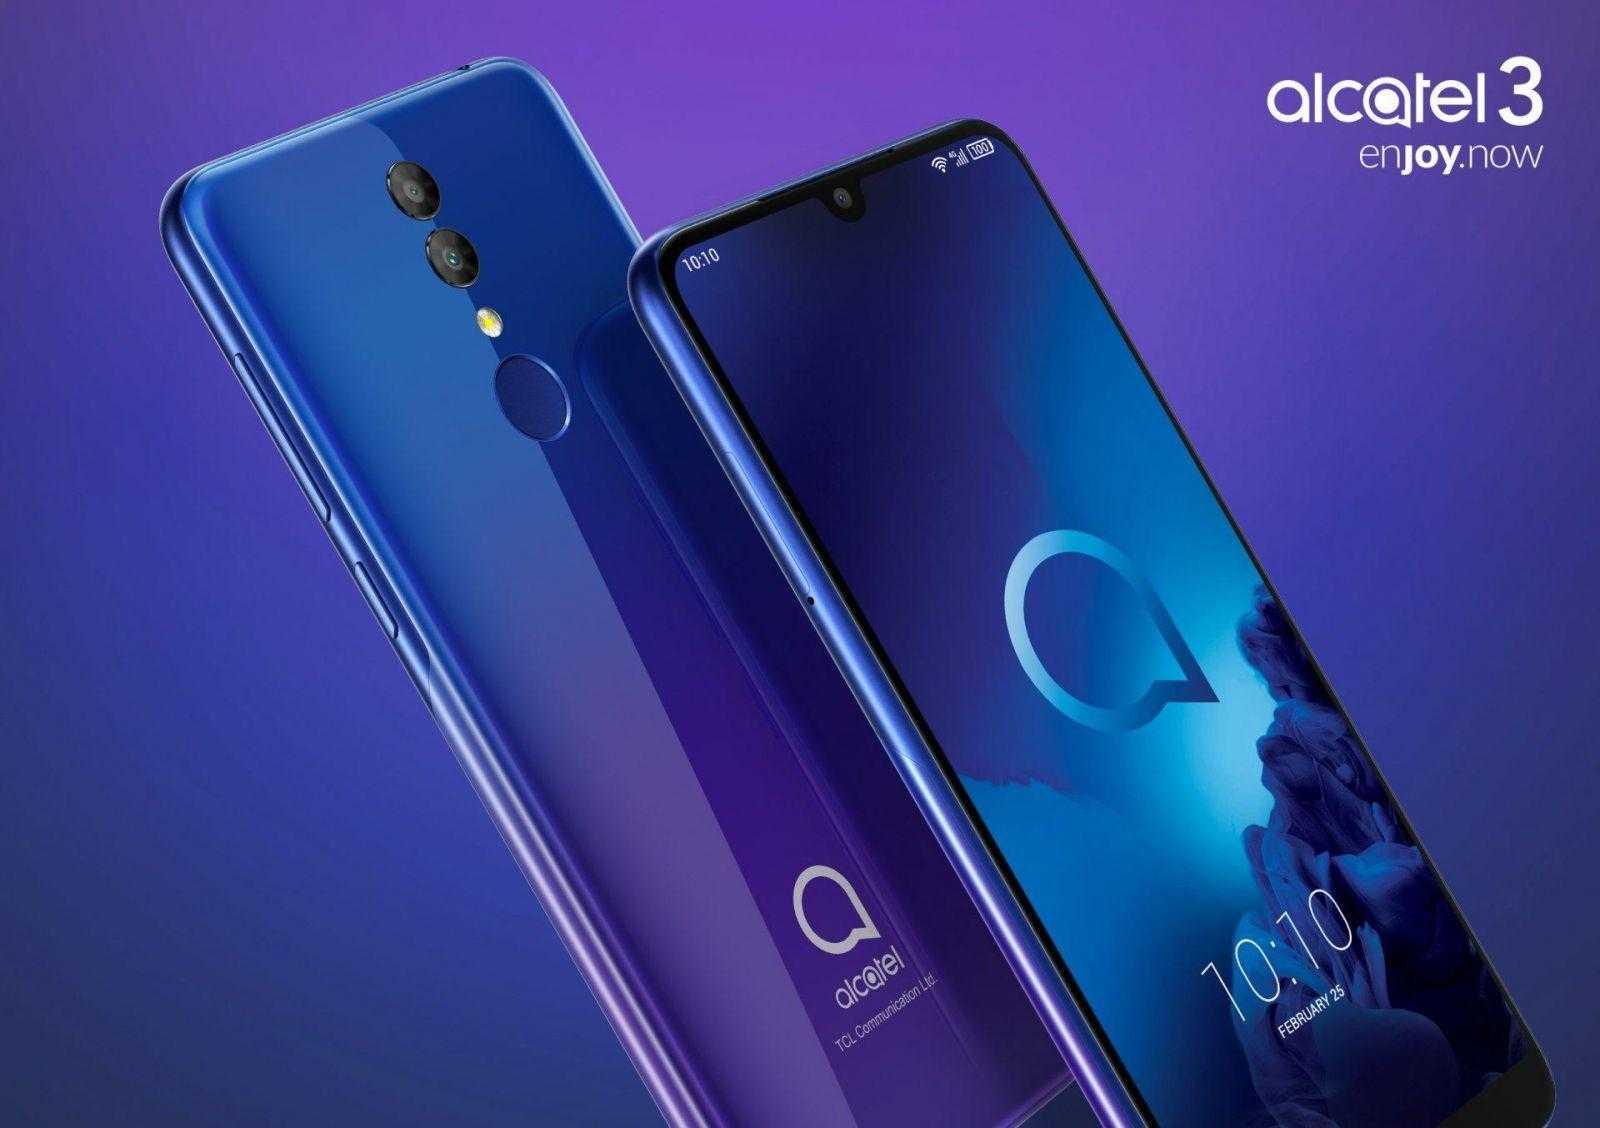 MWC 2019. Alcatel показала смартфоны 3-й серии Alcatel 3 и 3L (Alcatel 3 pressview 01)